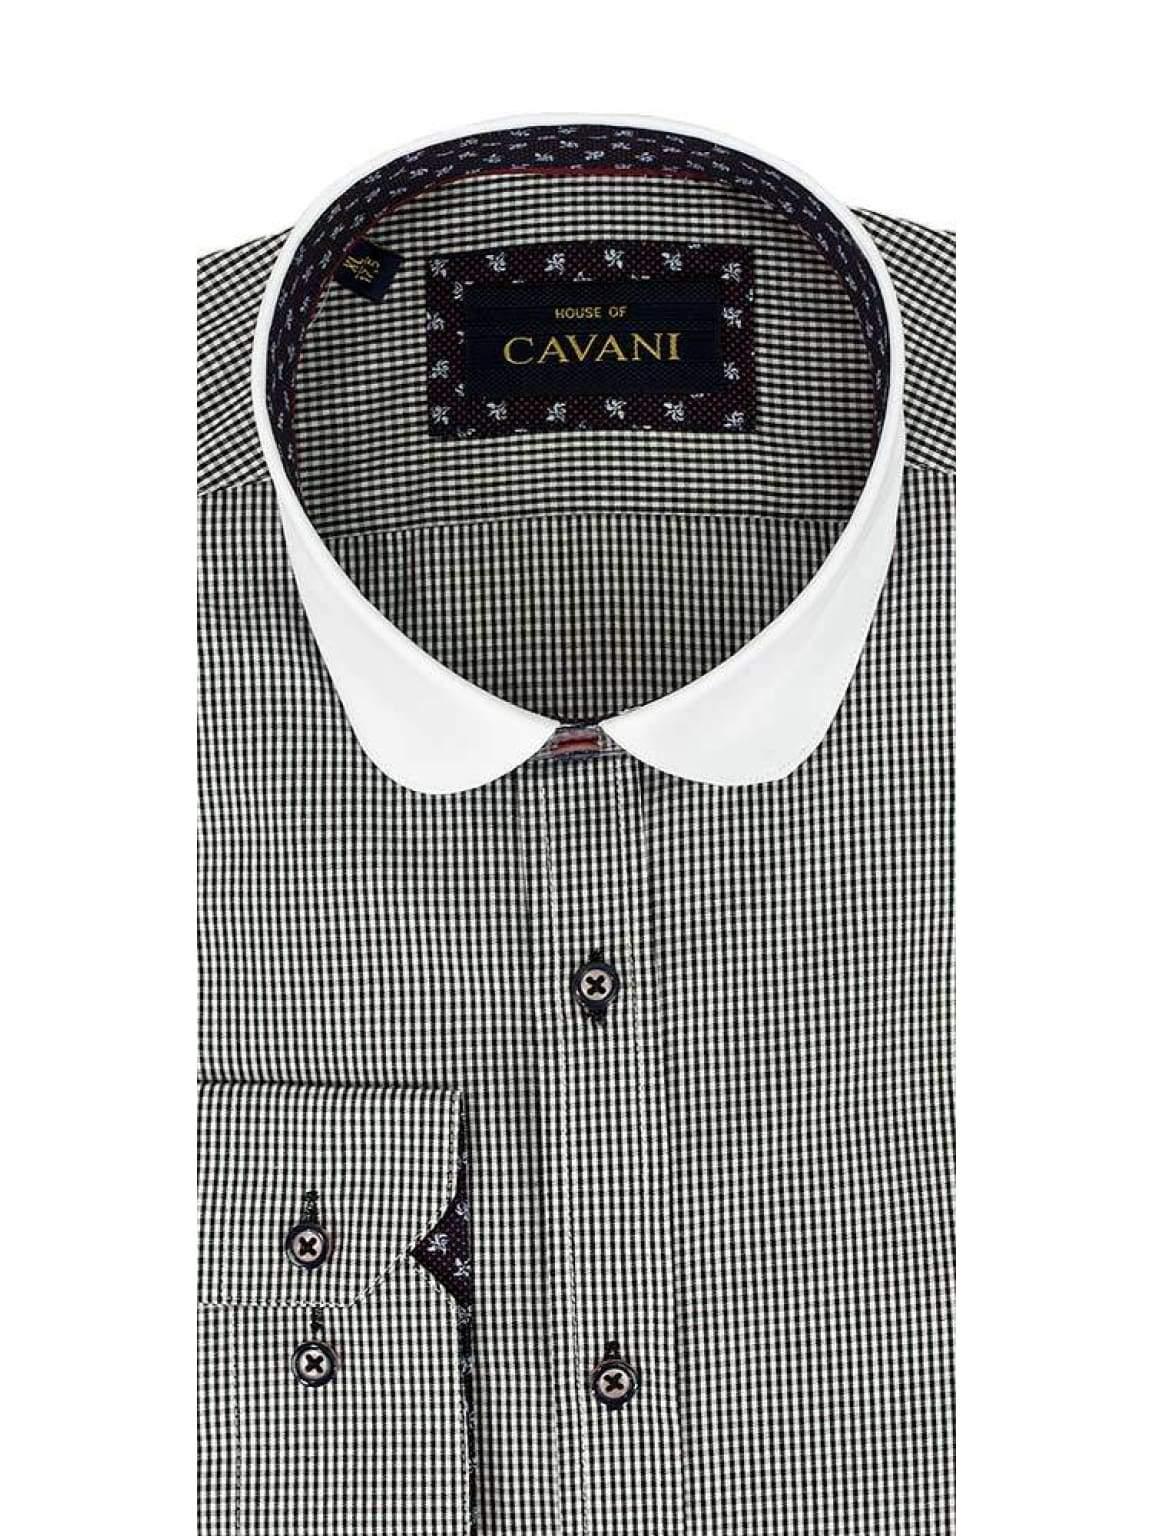 Cavani Penny Collar Black Gingham Check Shirt - UK 14.5 | EU 37 - Shirts